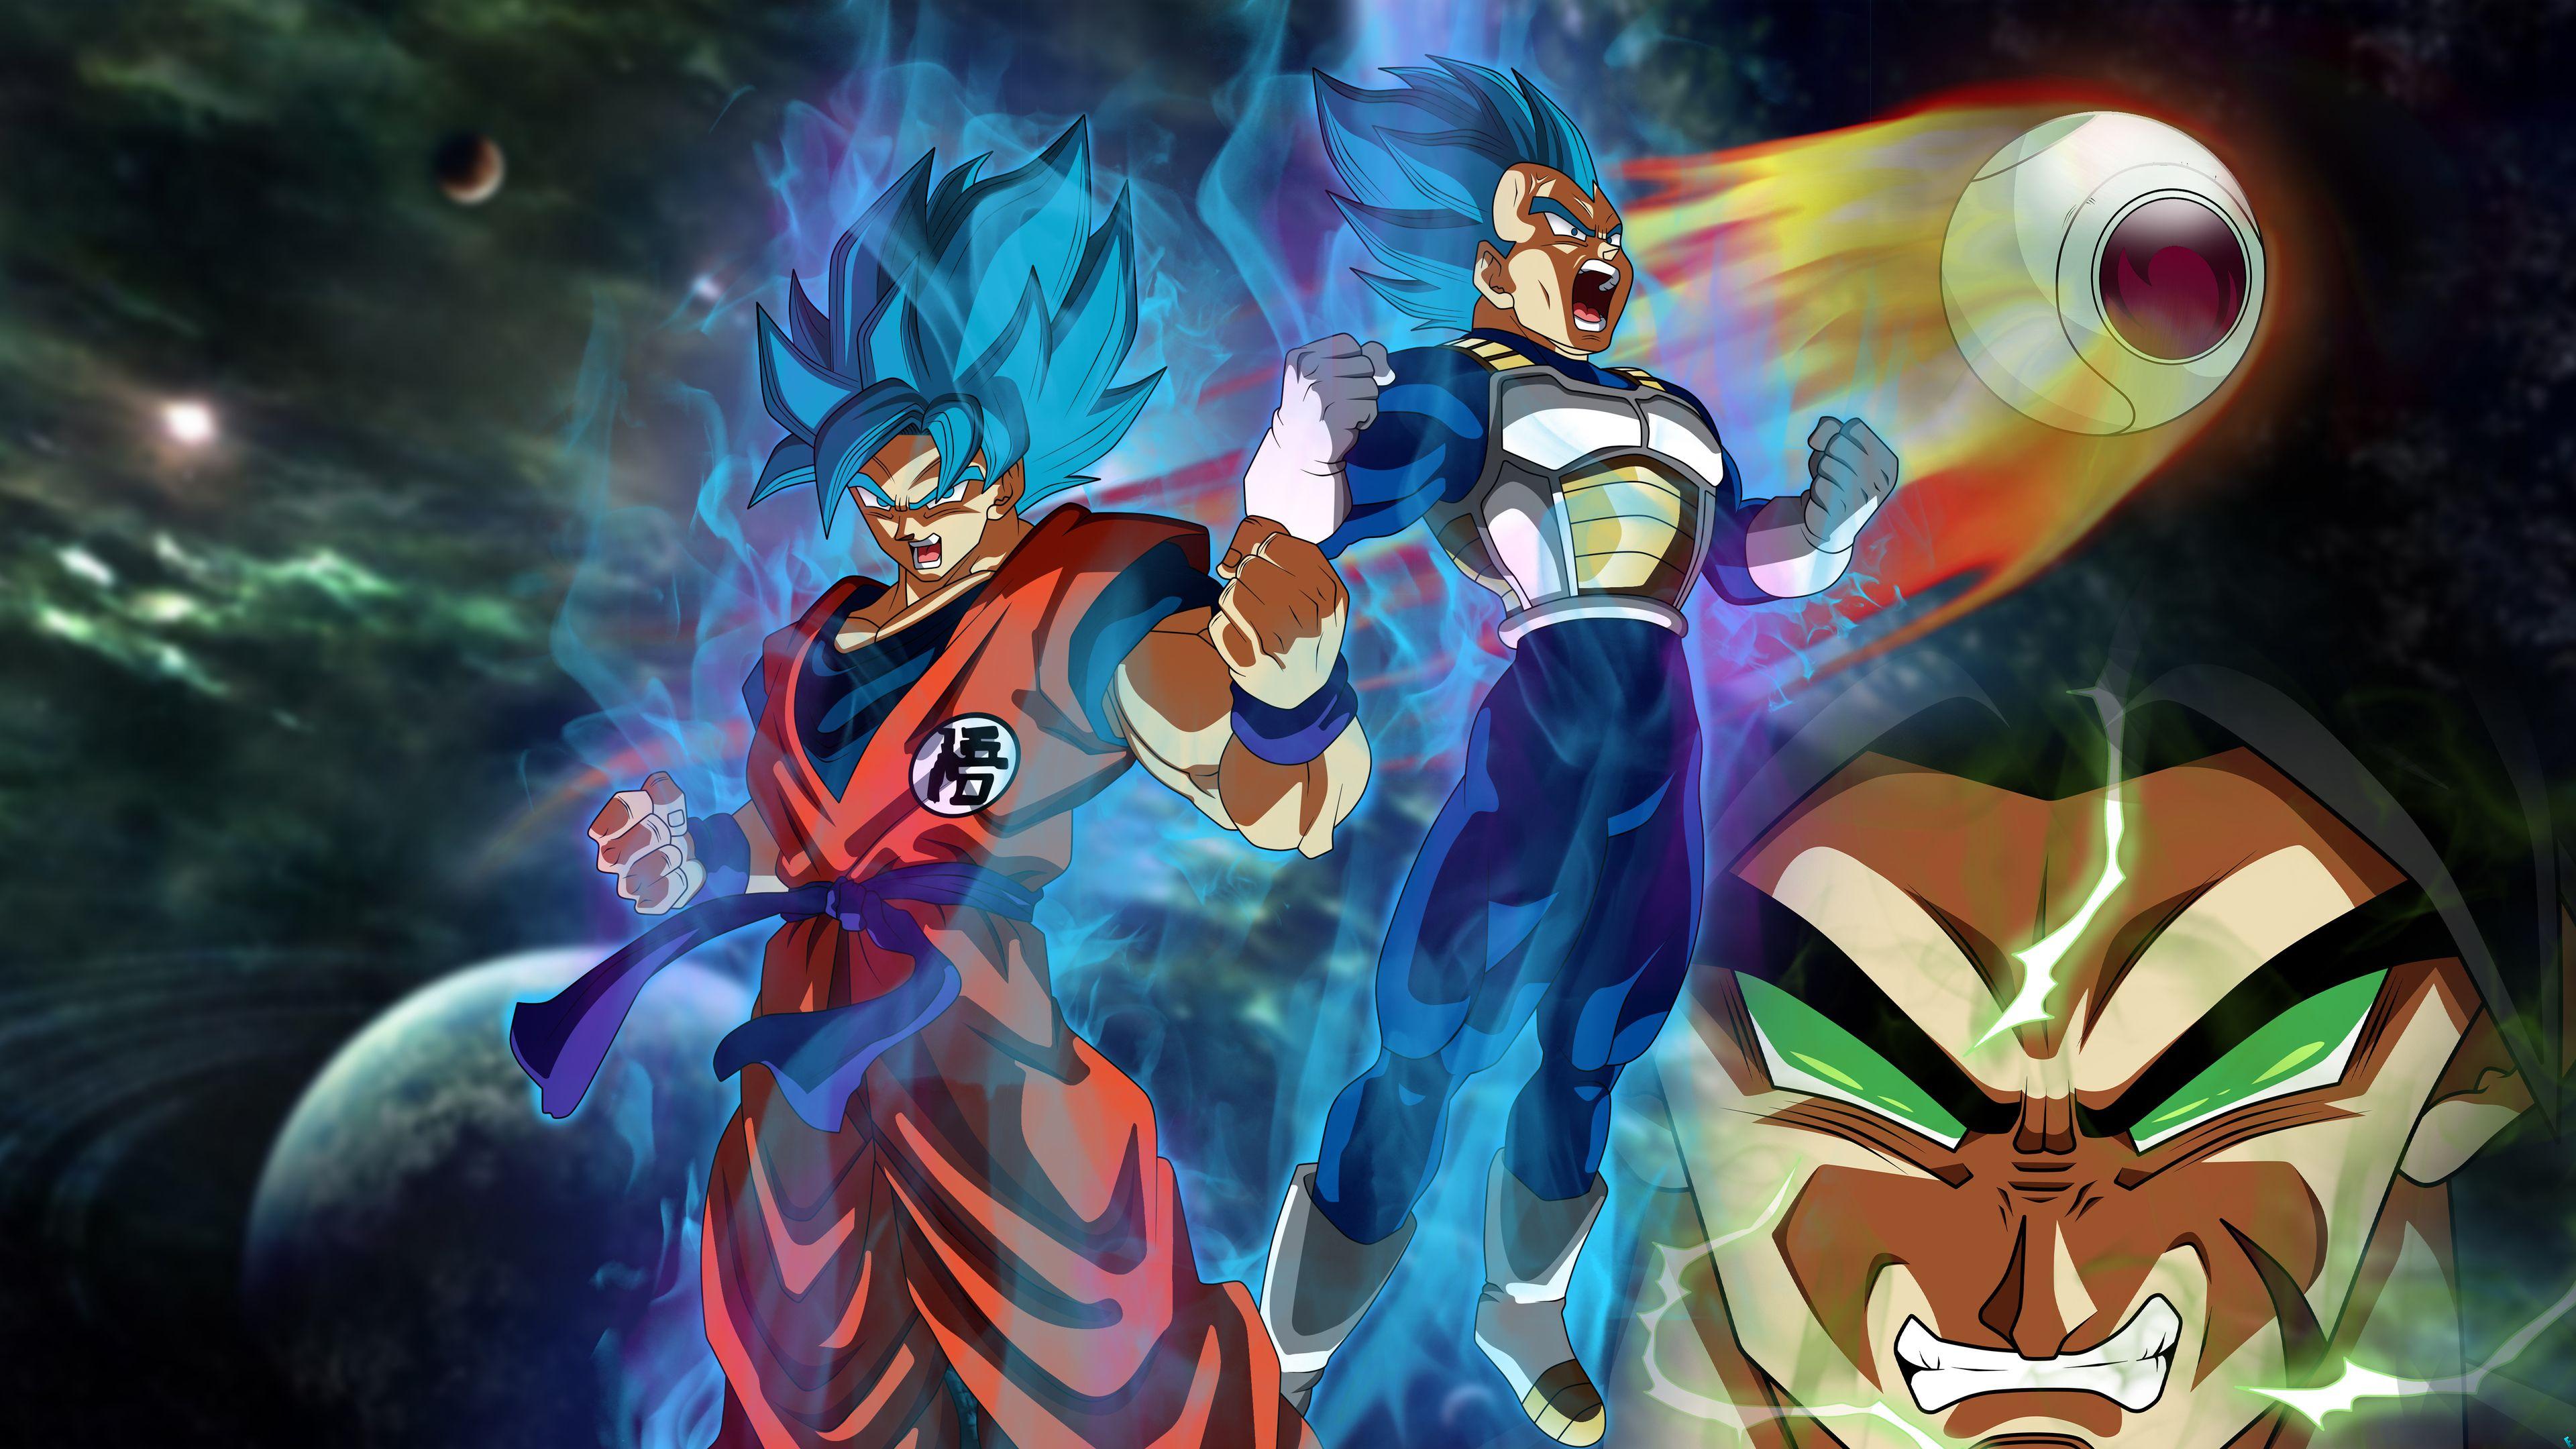 Goku Vegeta Dragon Ball Super 4k Hd Wallpapers Goku